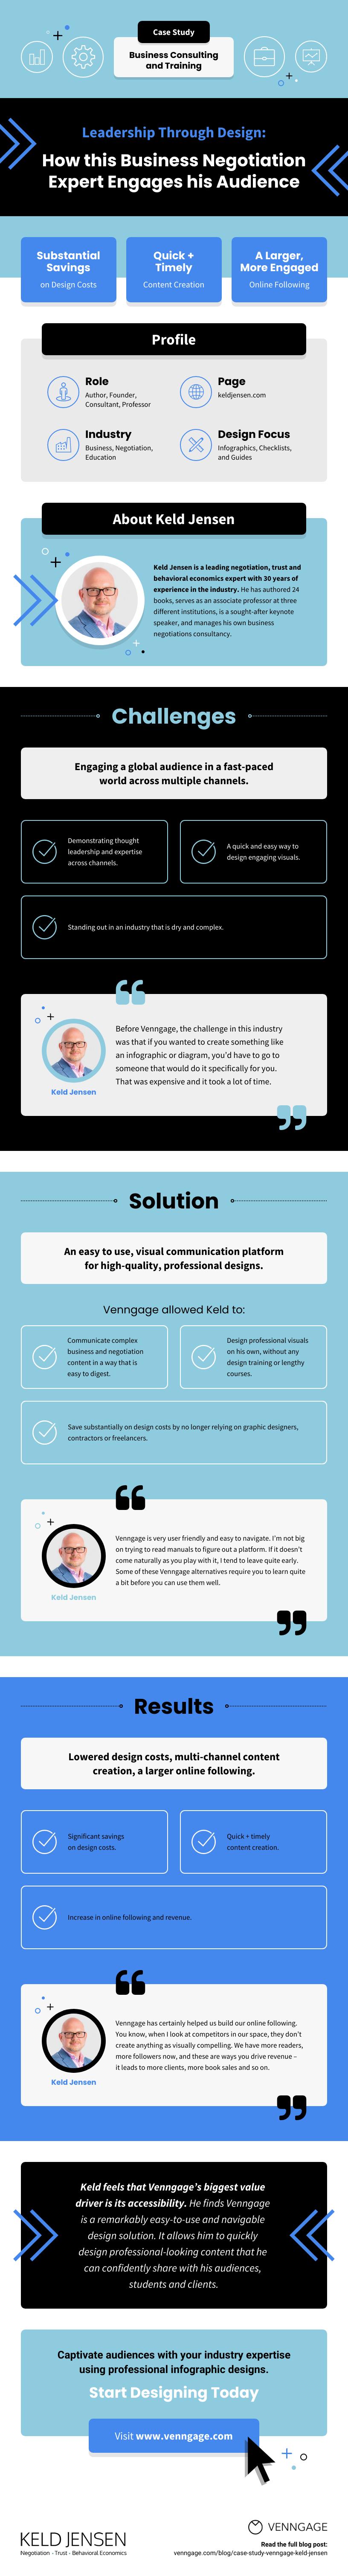 Keld_Jensen_Case_Study_Infographic